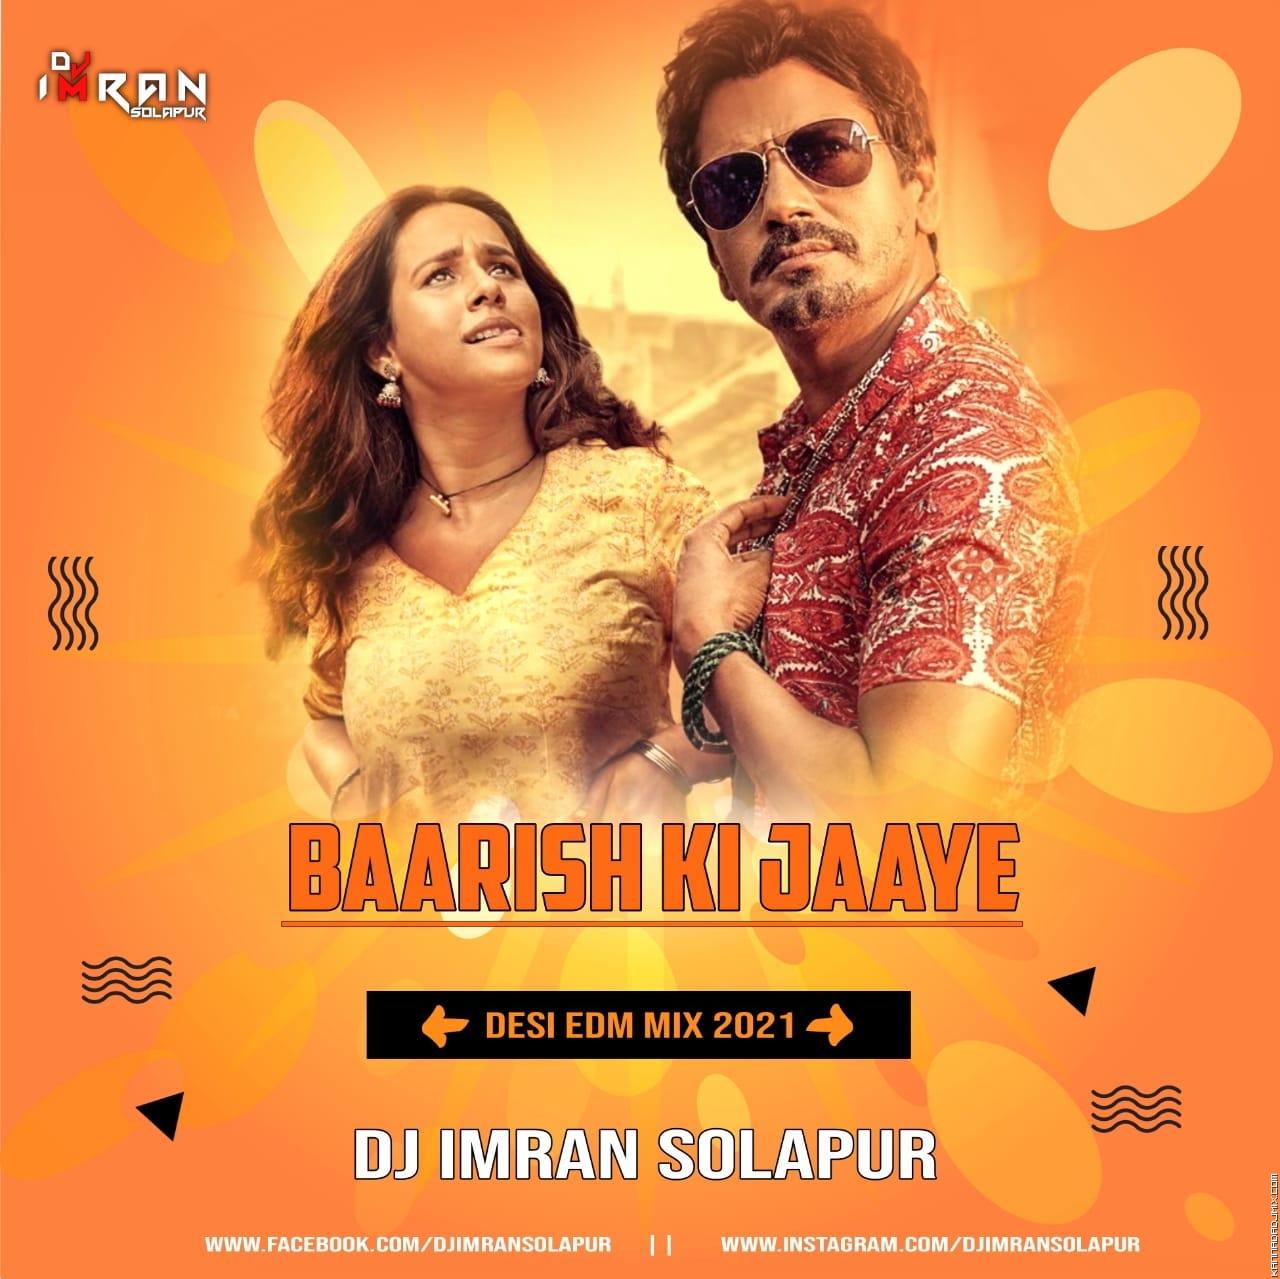 Baarish Ki Jaaye - Desi EDM Mix 2021 - DJ Imran Solapur.mp3